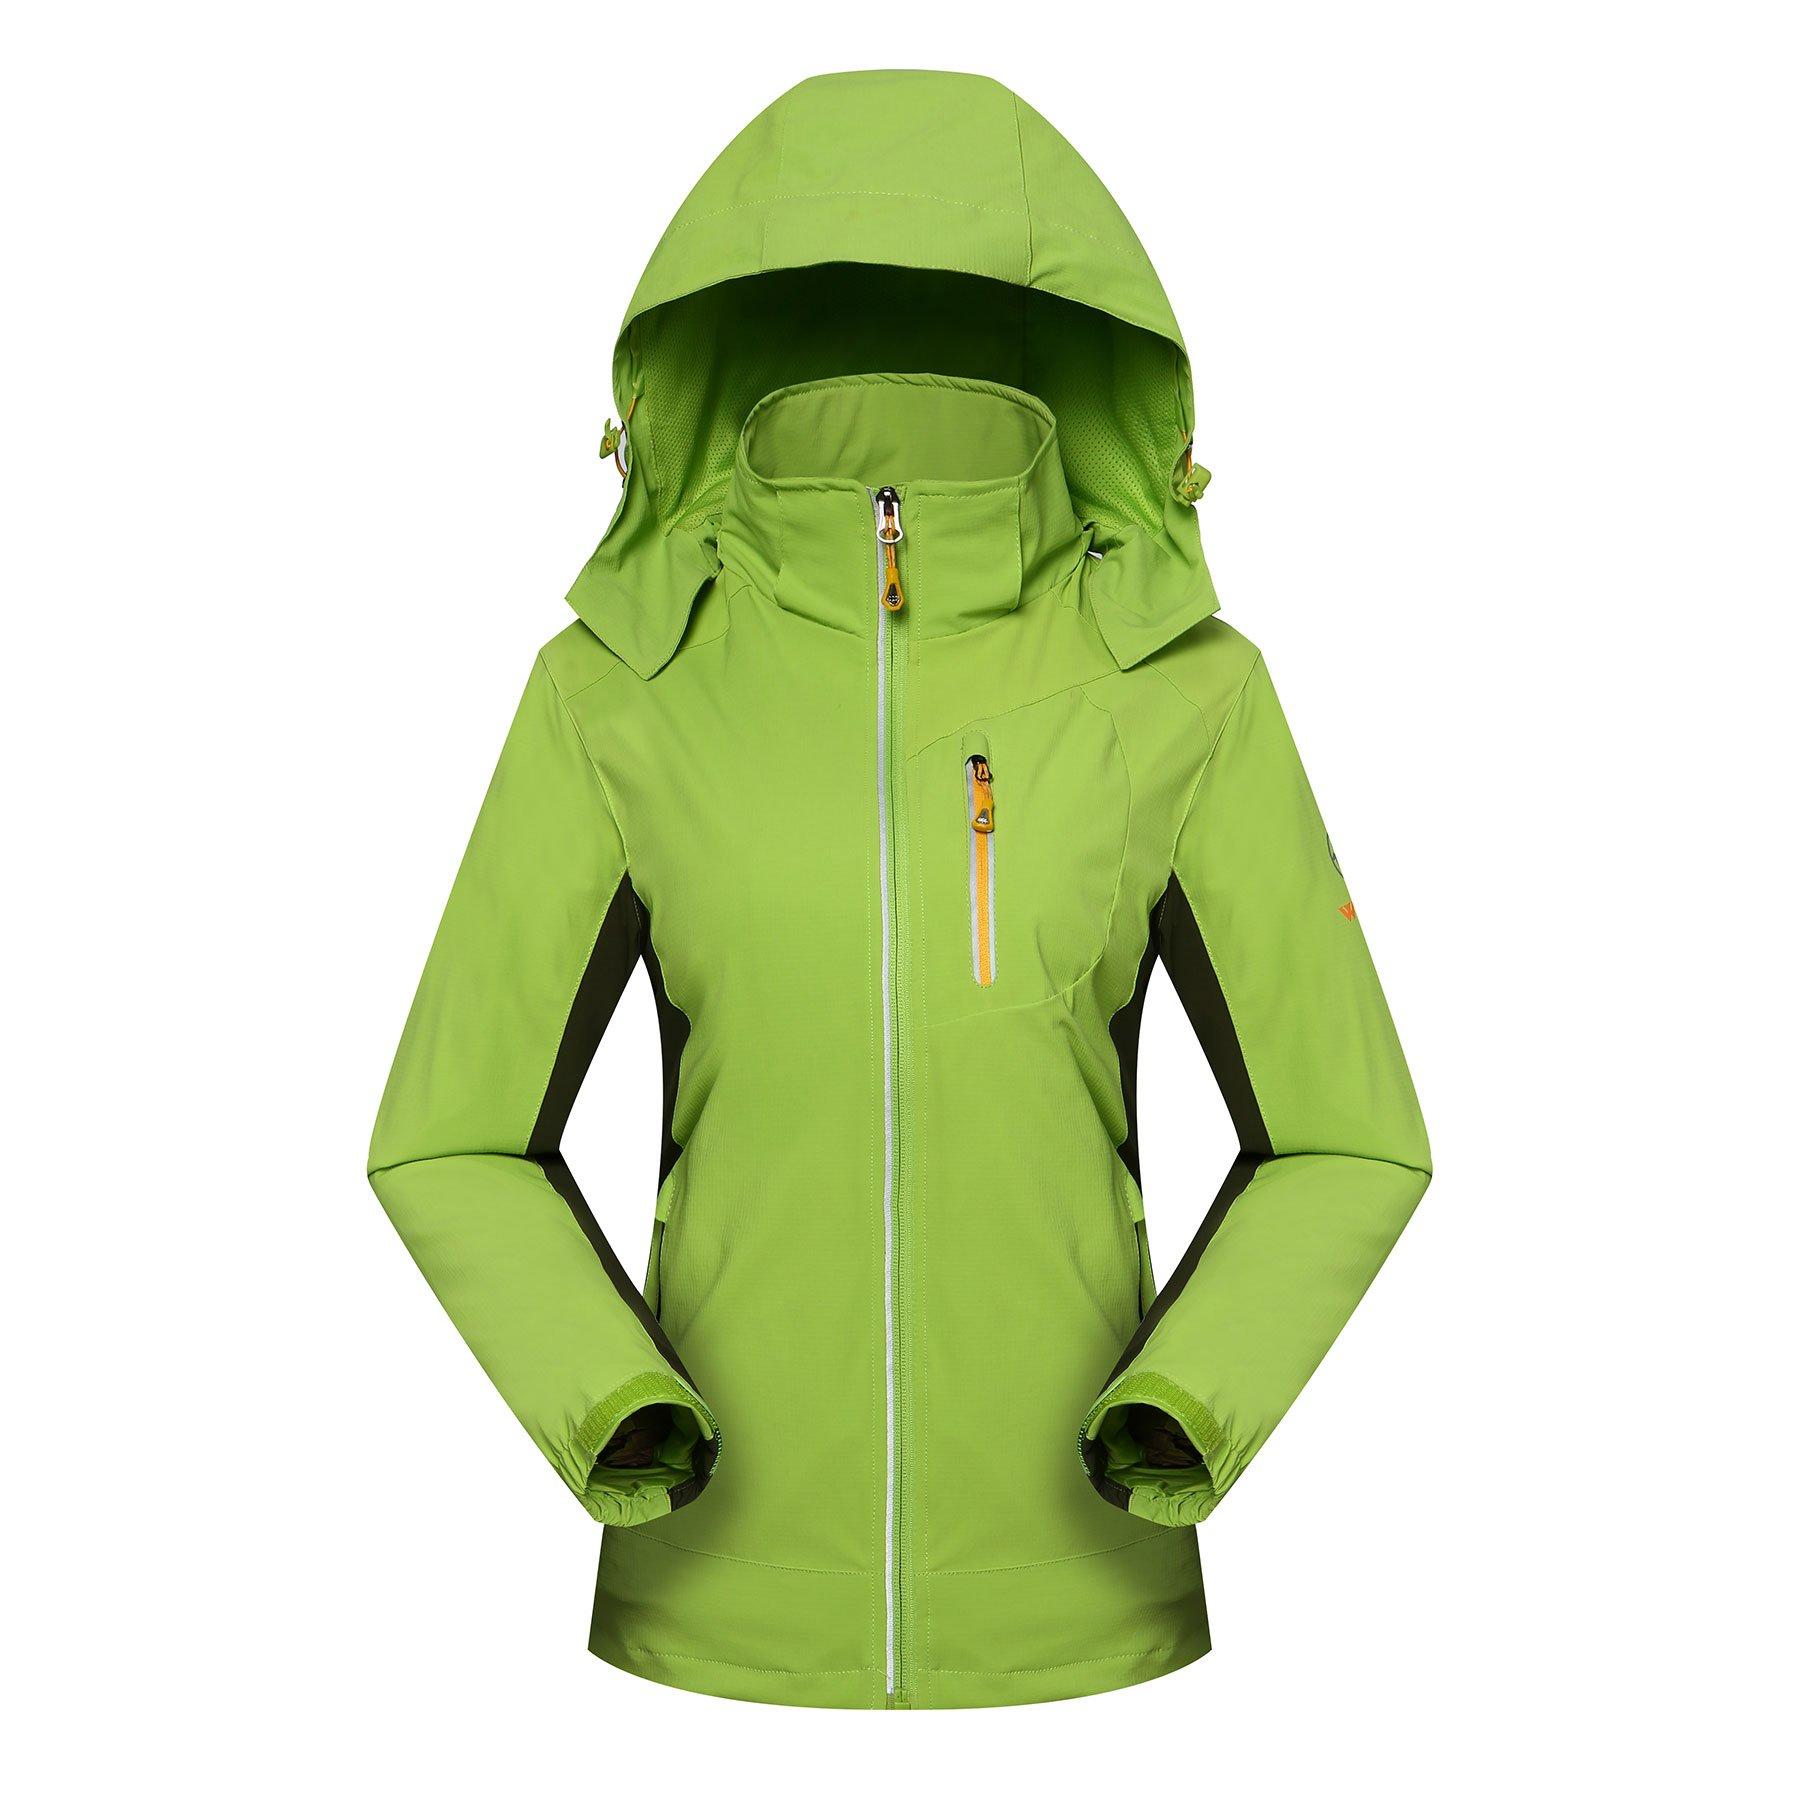 Diamond Candy Coats and Jacket Softshell Women Sportswear